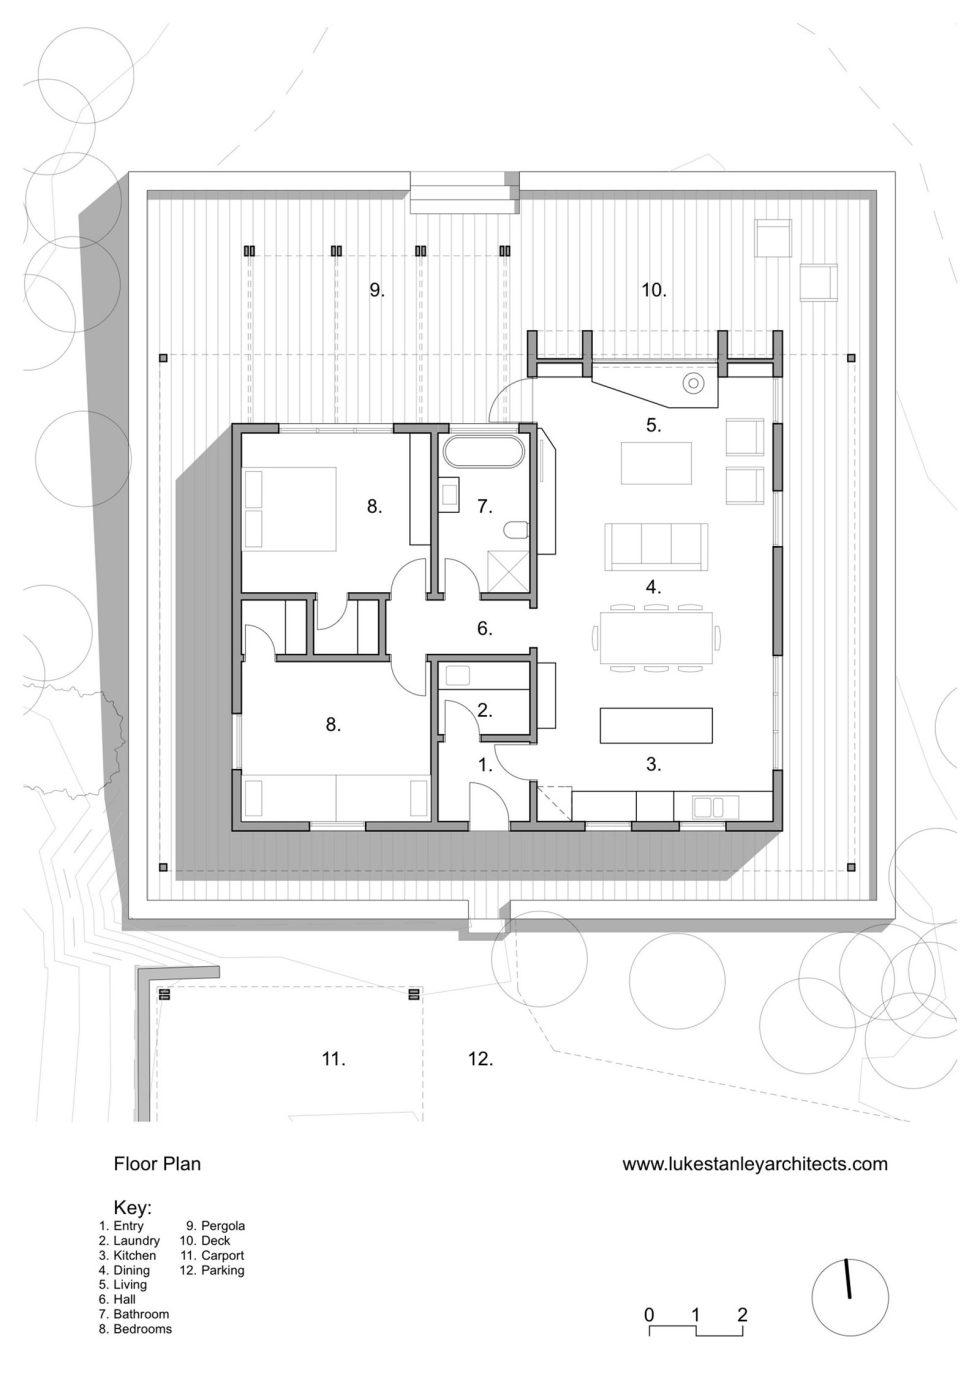 Plinth House in Australia from the Luke Stanley Architects - Floor Plan